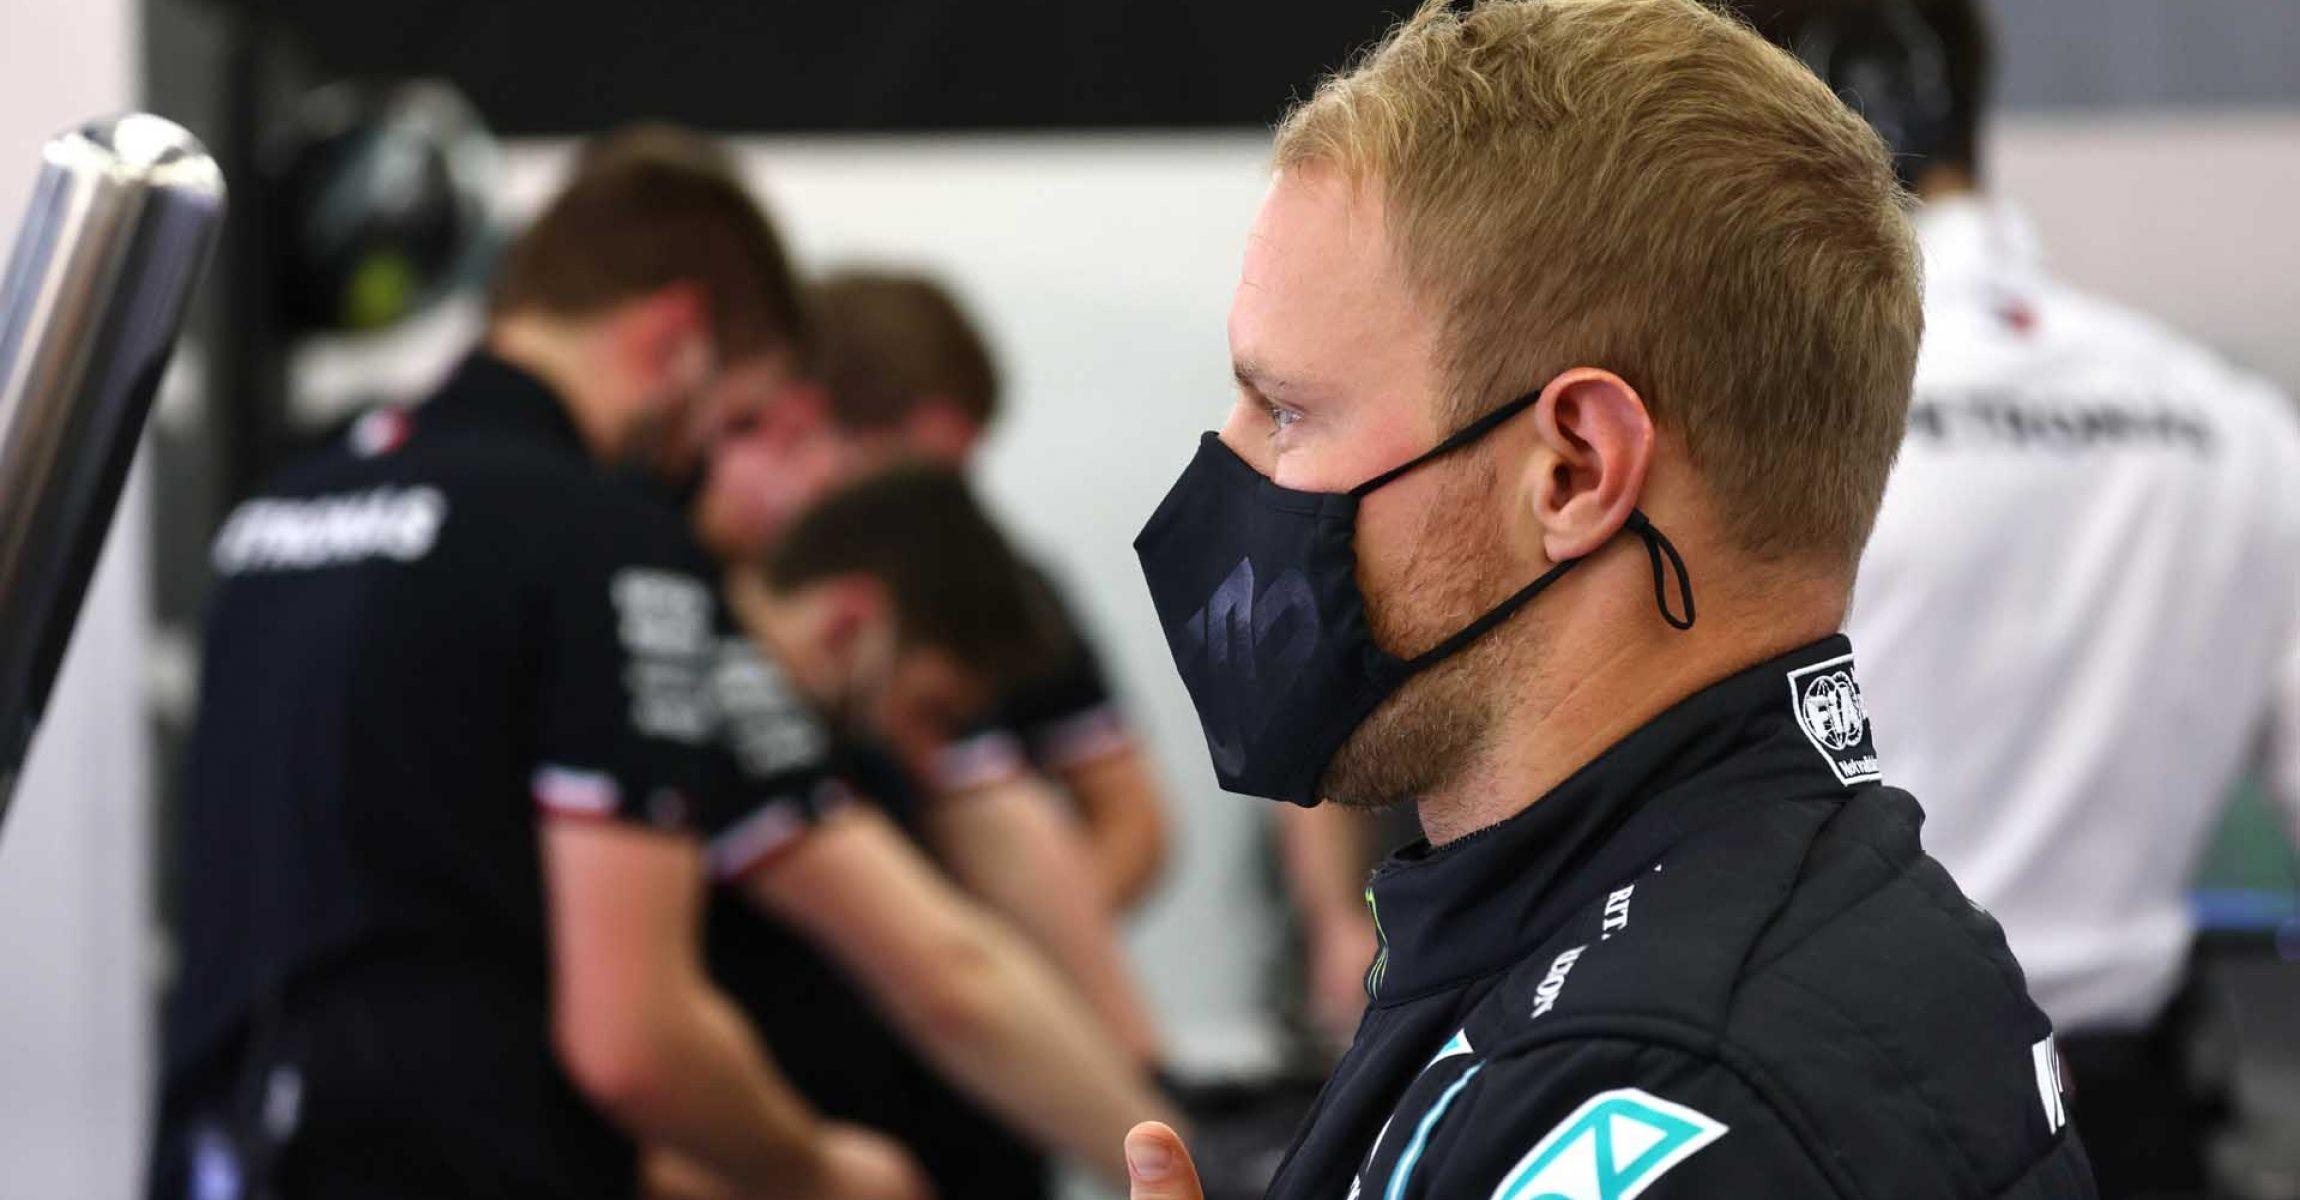 2021 Bahrain Grand Prix, Saturday - Steve Etherington Valtteri Bottas Mercedes